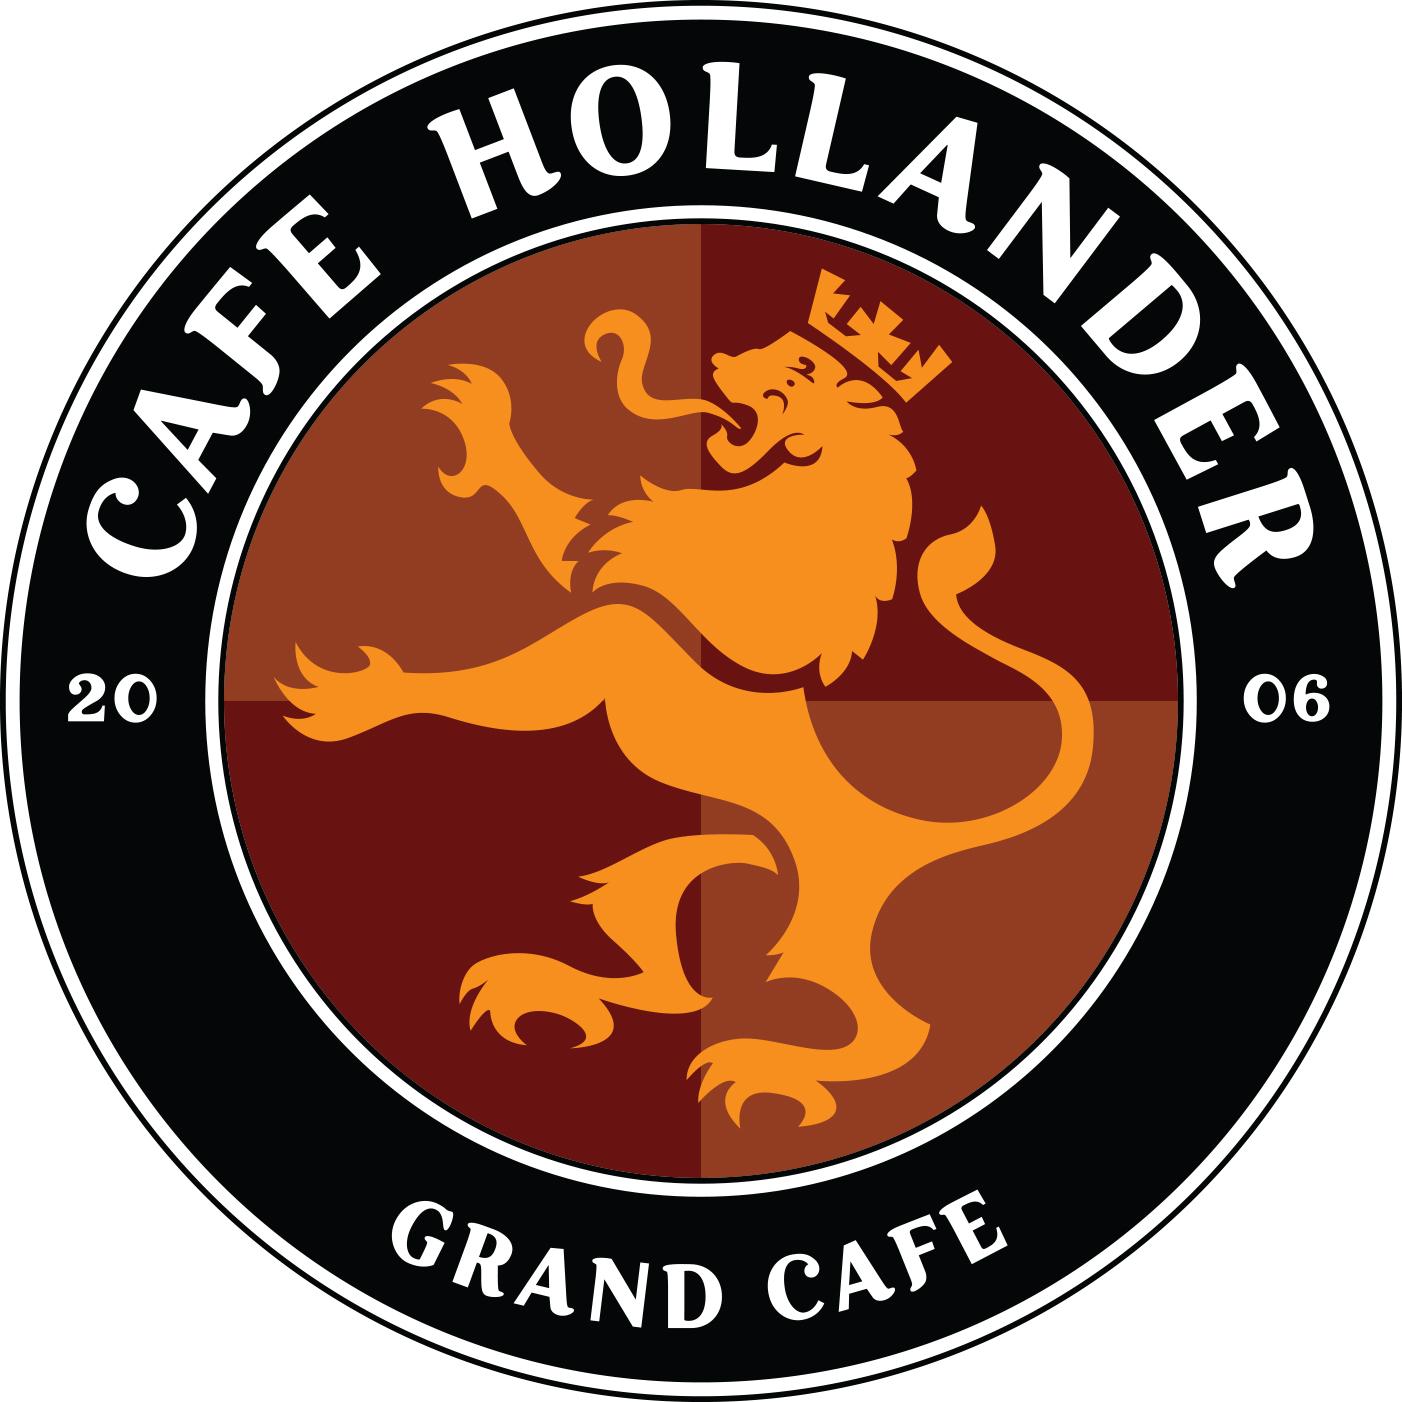 CafeHollanderLogo